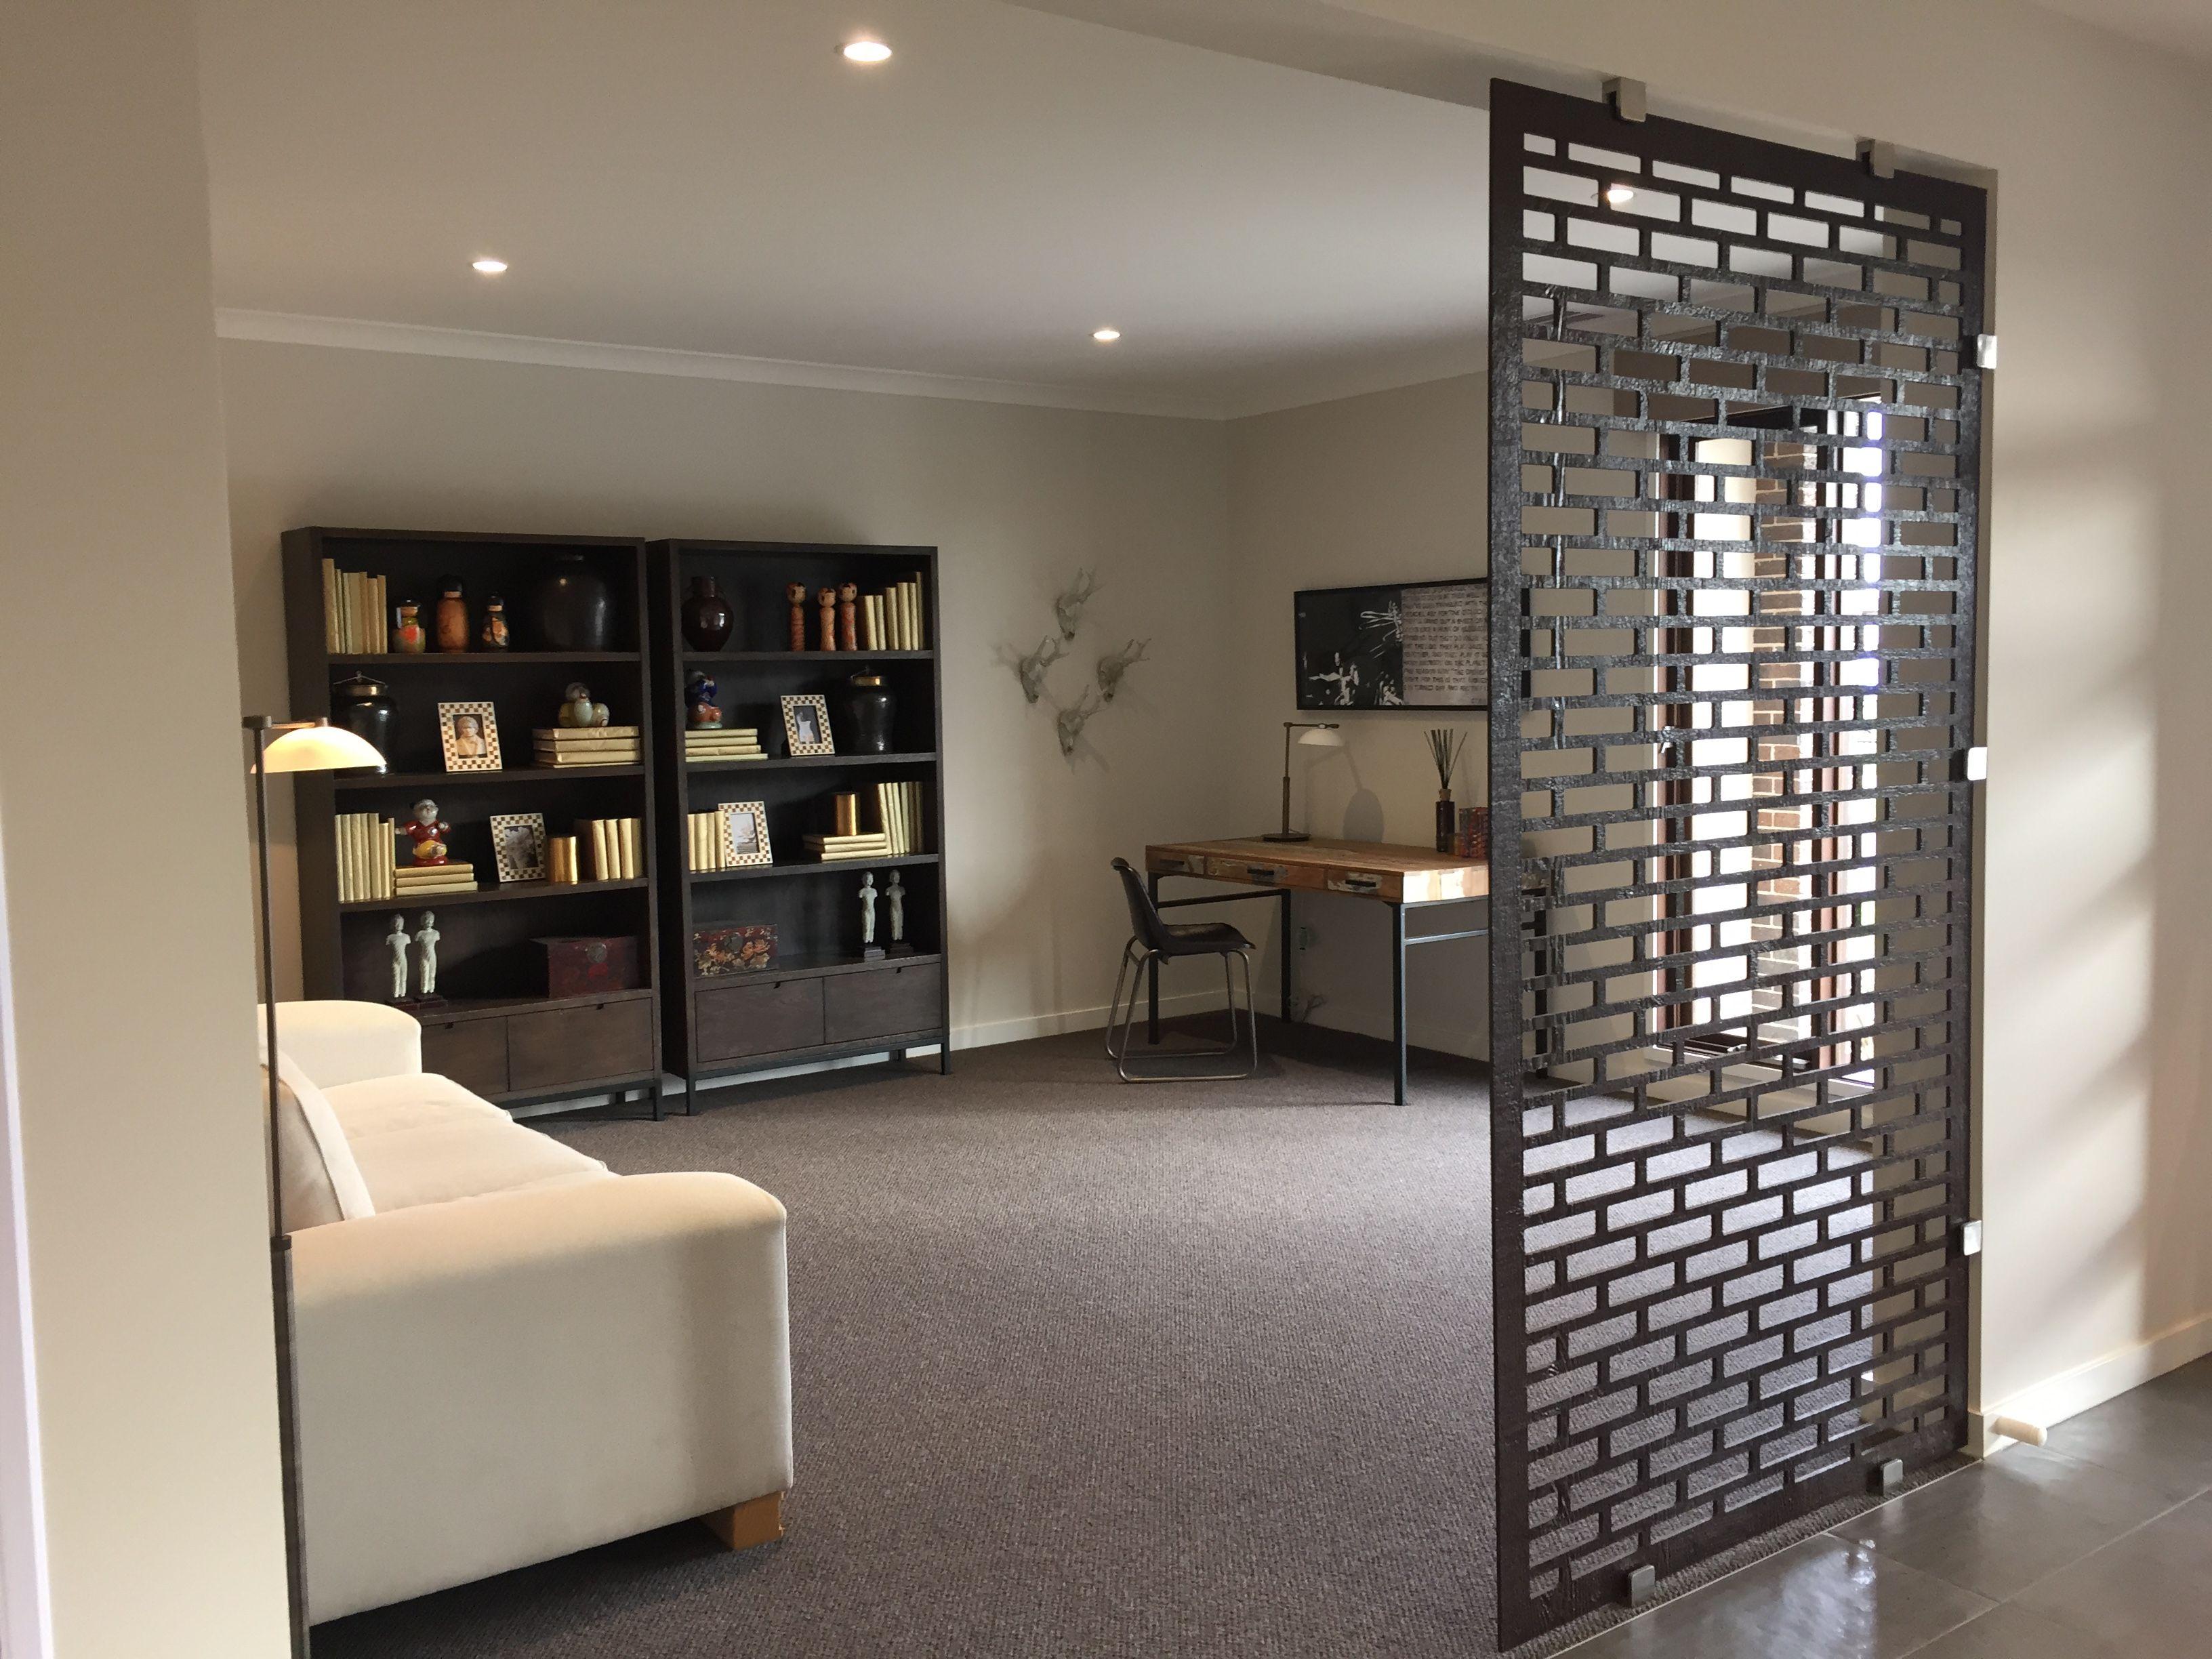 Decorative Screens, Indoor Screens, Room Divider, Alfresco, Outdoor Living